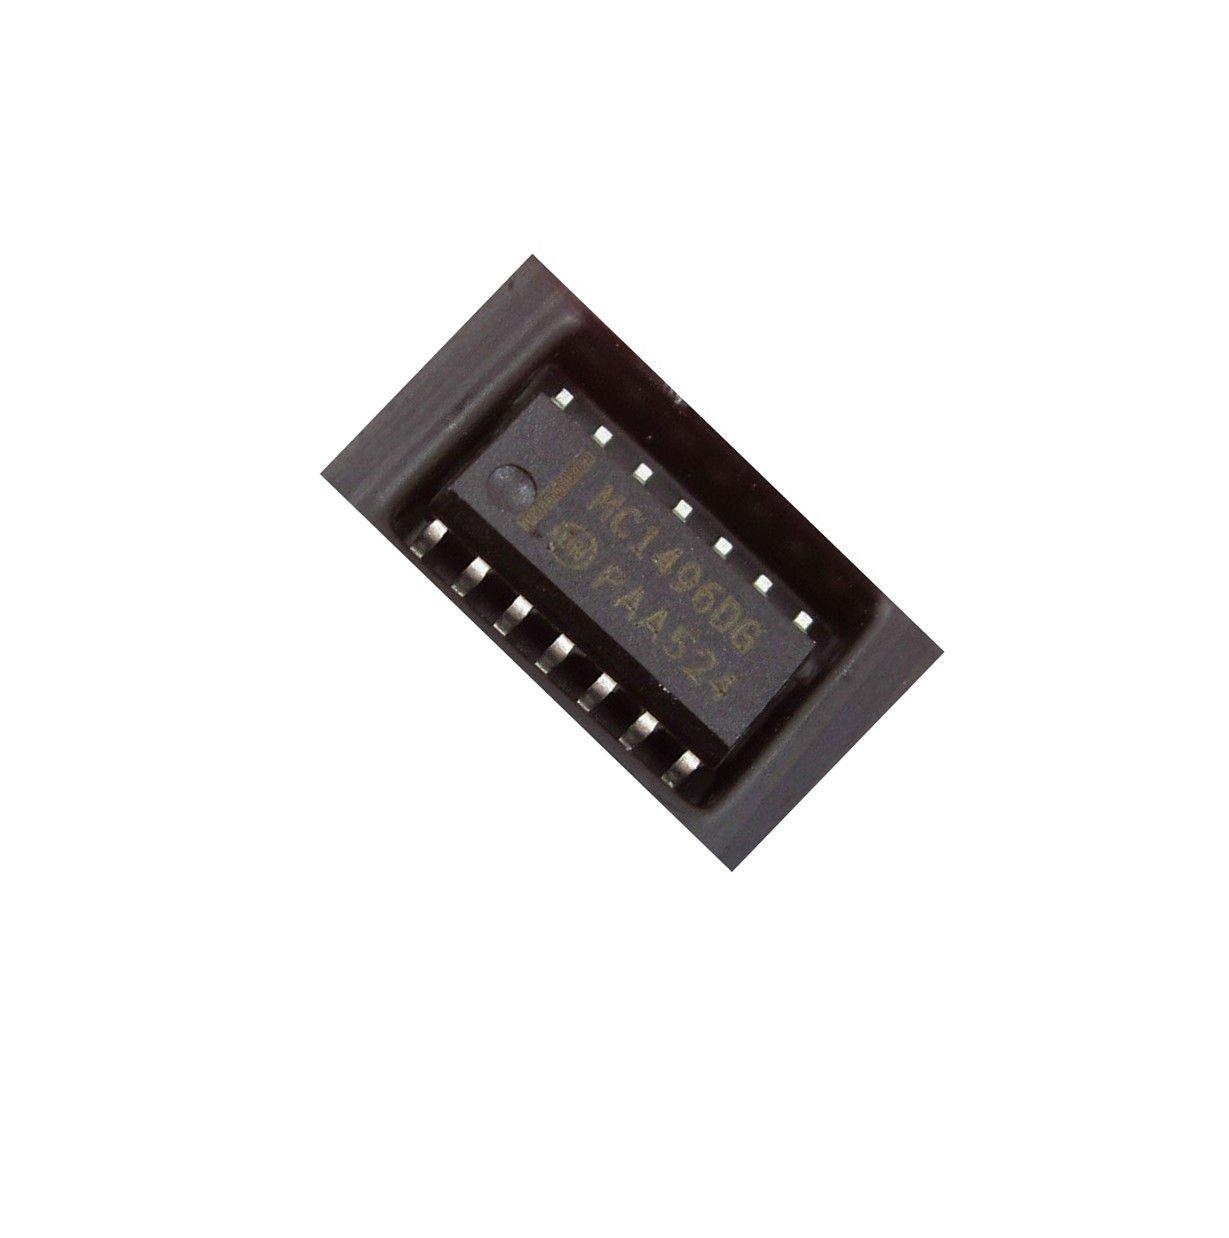 5 PCS MC1496DG ON IC MODULATOR//DEMODULATOR 14-SOIC NEW